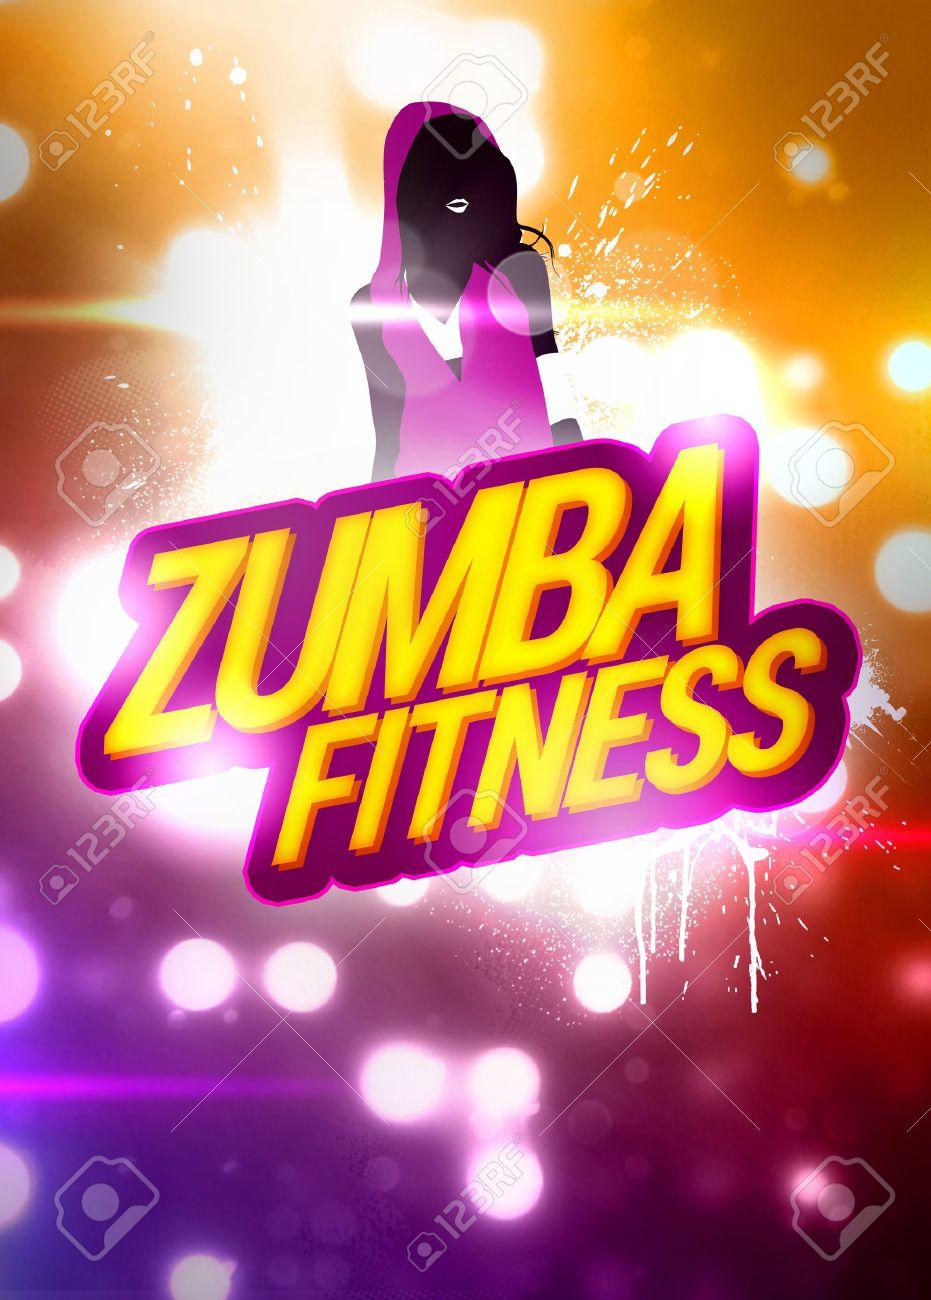 Zumba poster design - Zumba Dance Zumba Fitness Training Invitation Advert Background With Empty Space